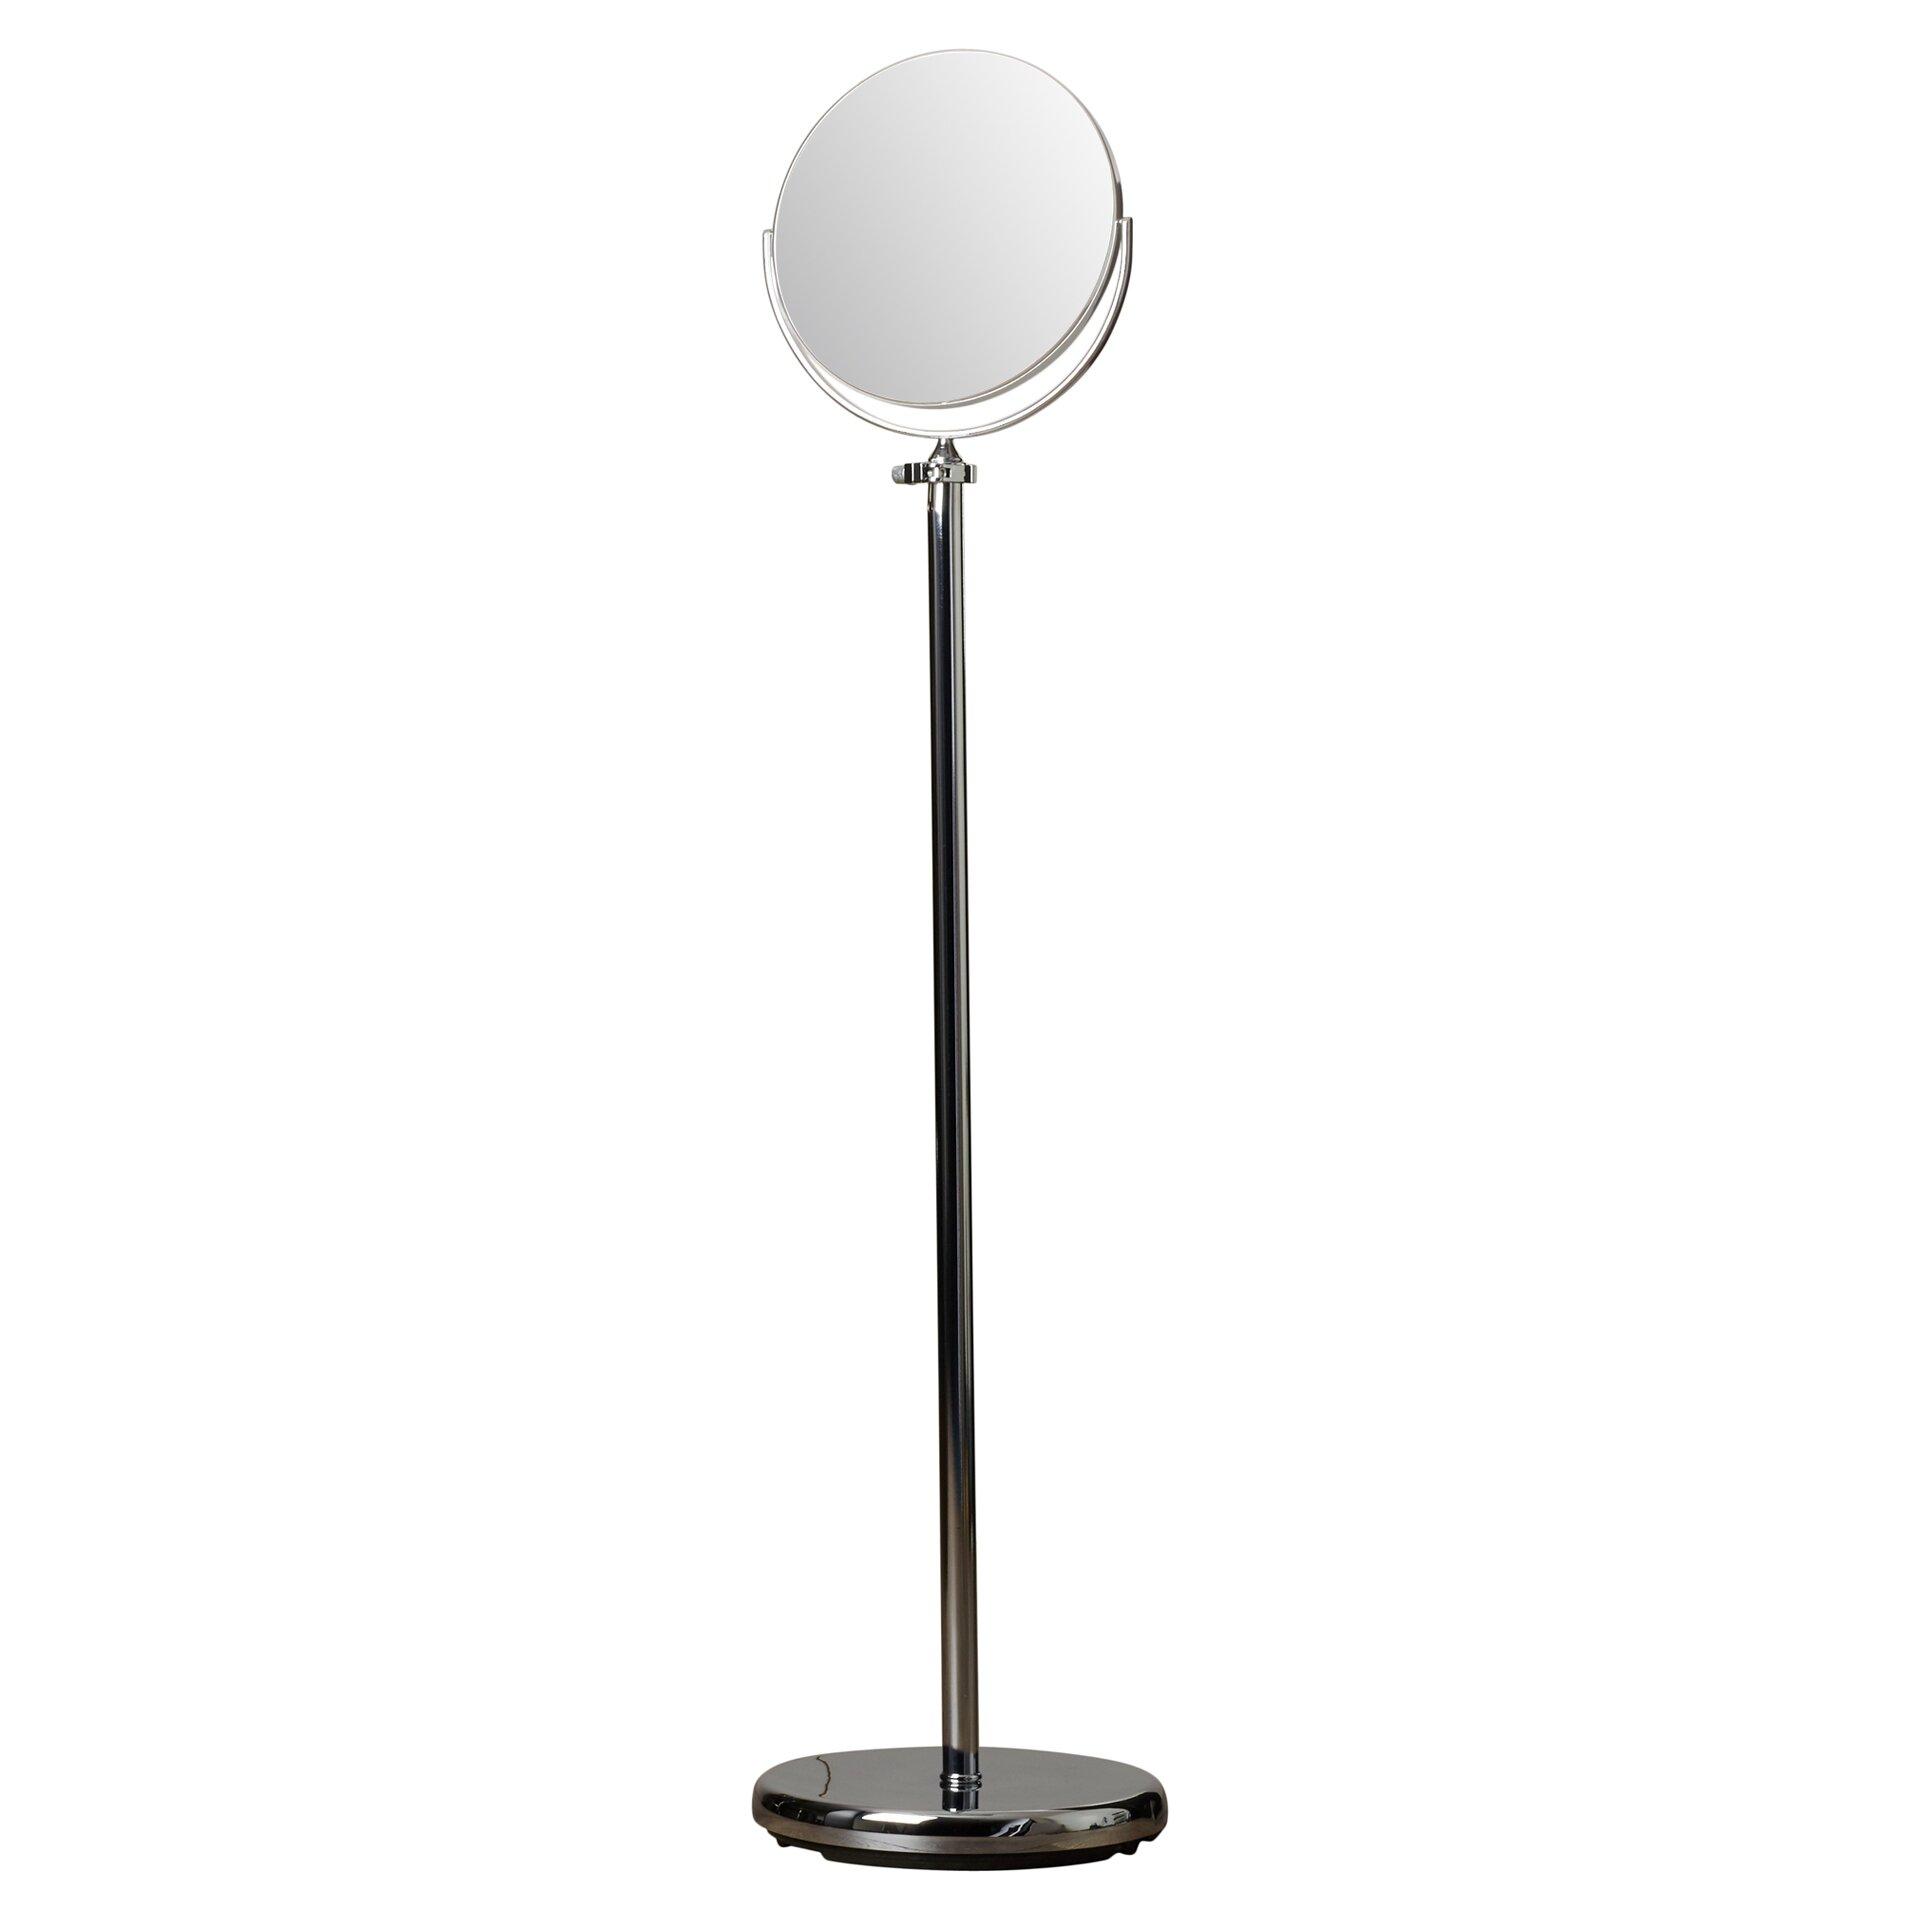 Adjustable Floor Mirror Gallery - home furniture designs pictures